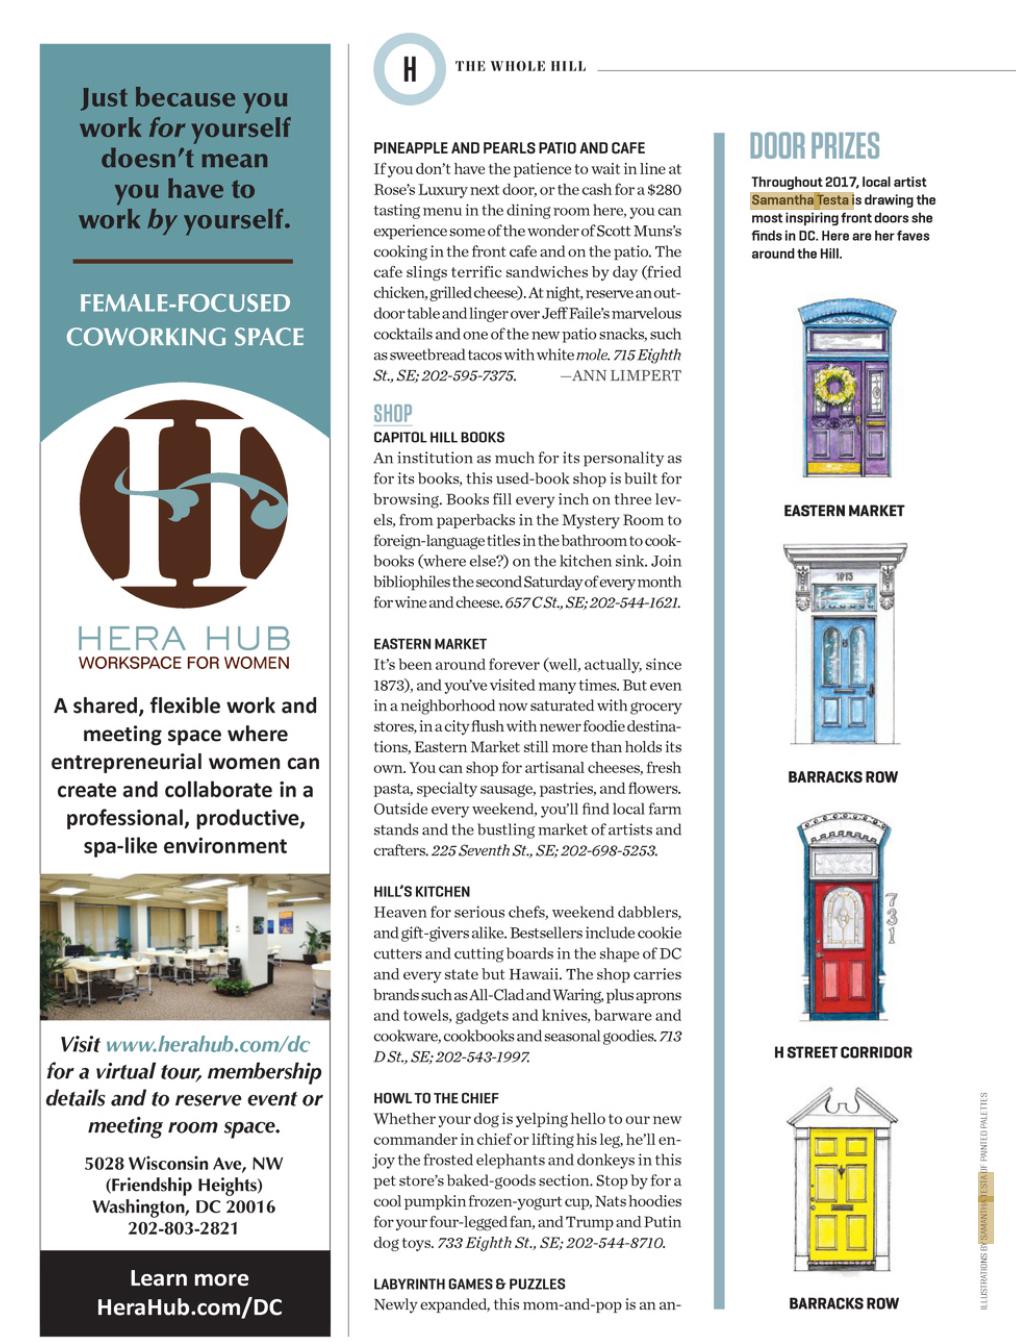 Washingtonian Magazine Feature